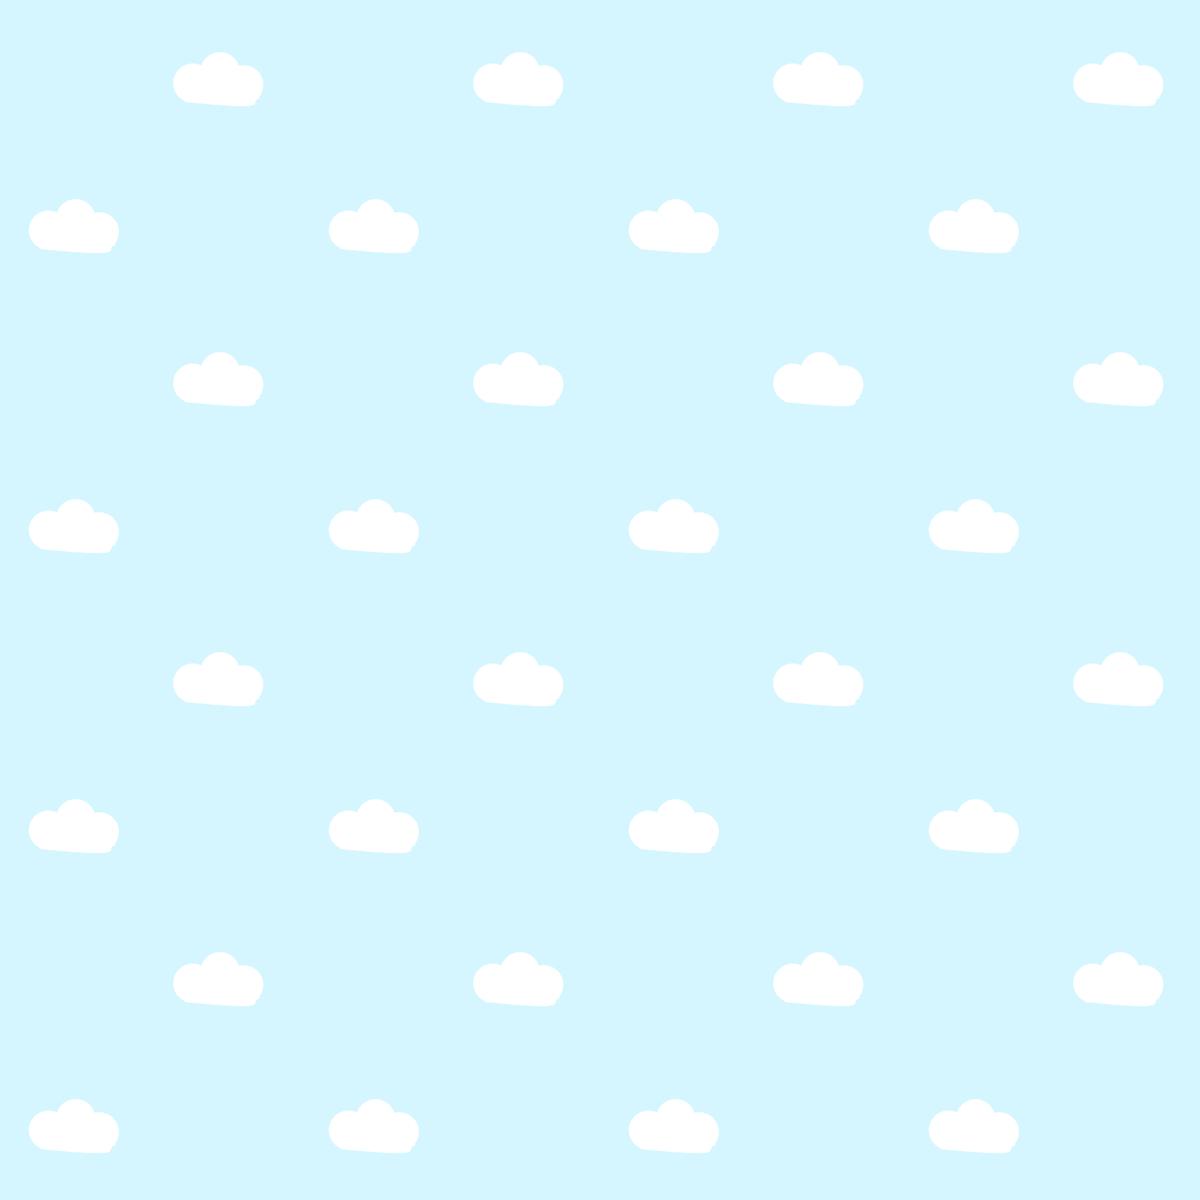 Free Digital Pastel Colored Scrapbooking Papers - Ausdruckbare - Free Printable Background Designs